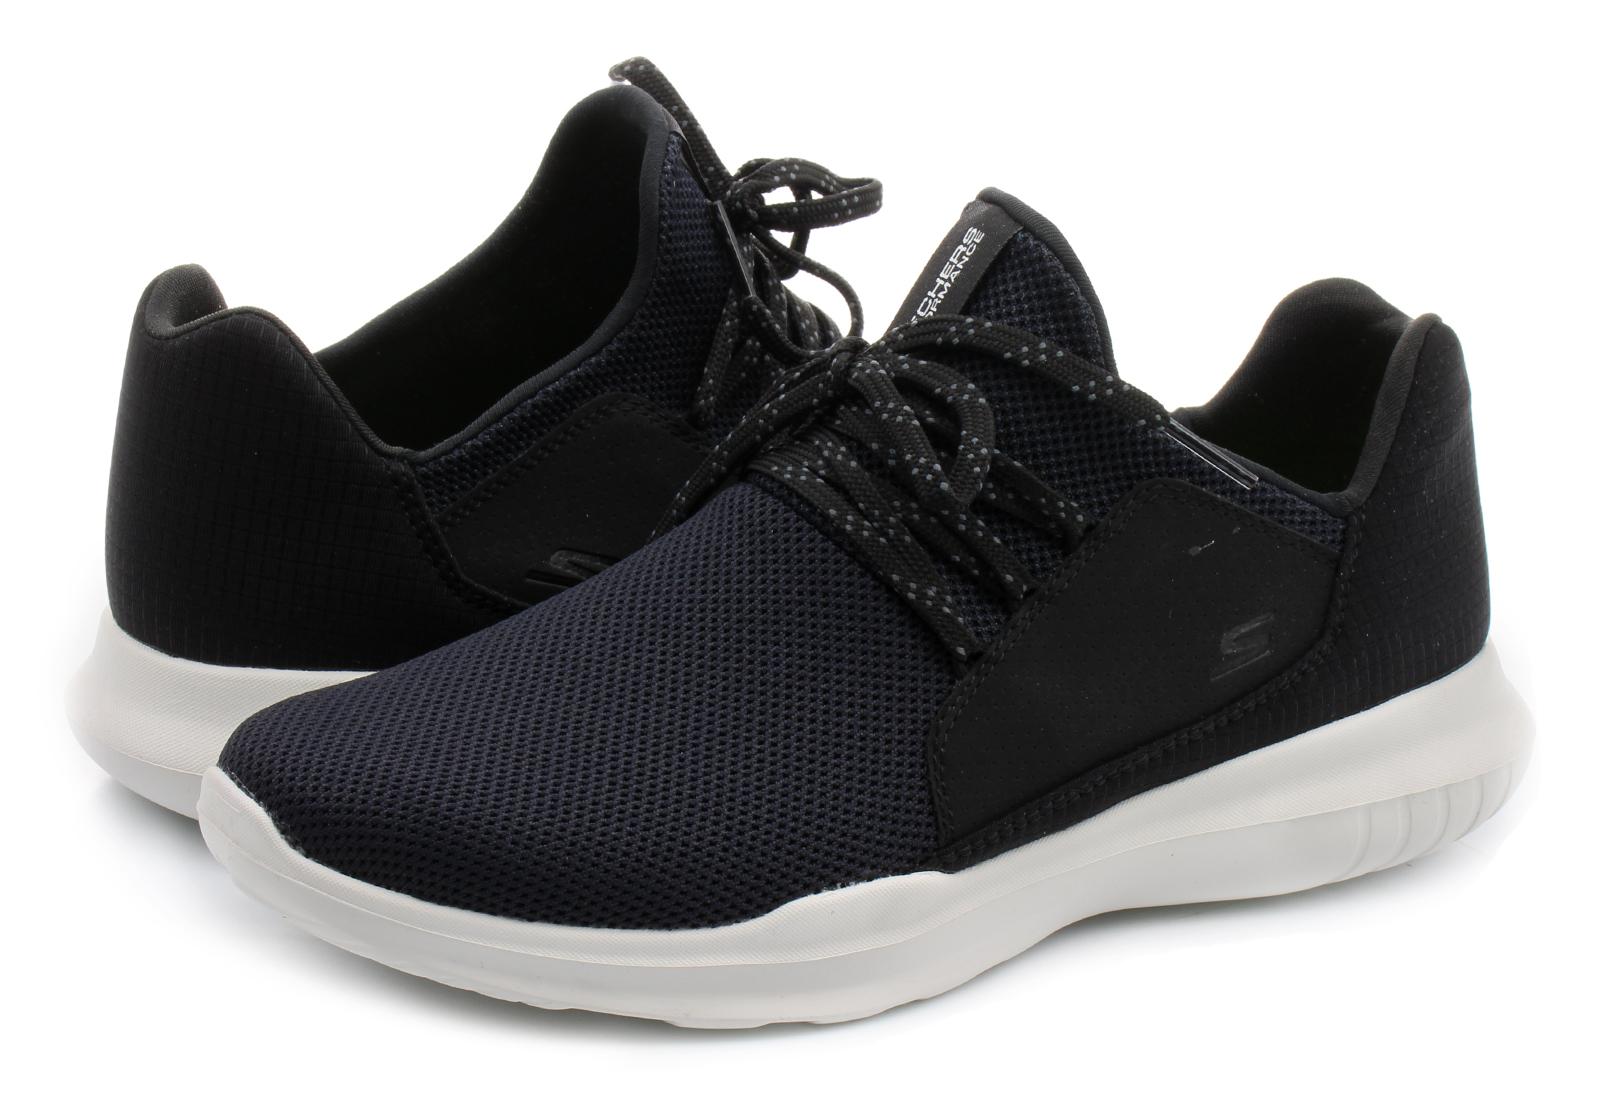 add969664b60 Skechers Shoes - Go Run Mojo - Verve - 14813-bkw - Online shop for ...